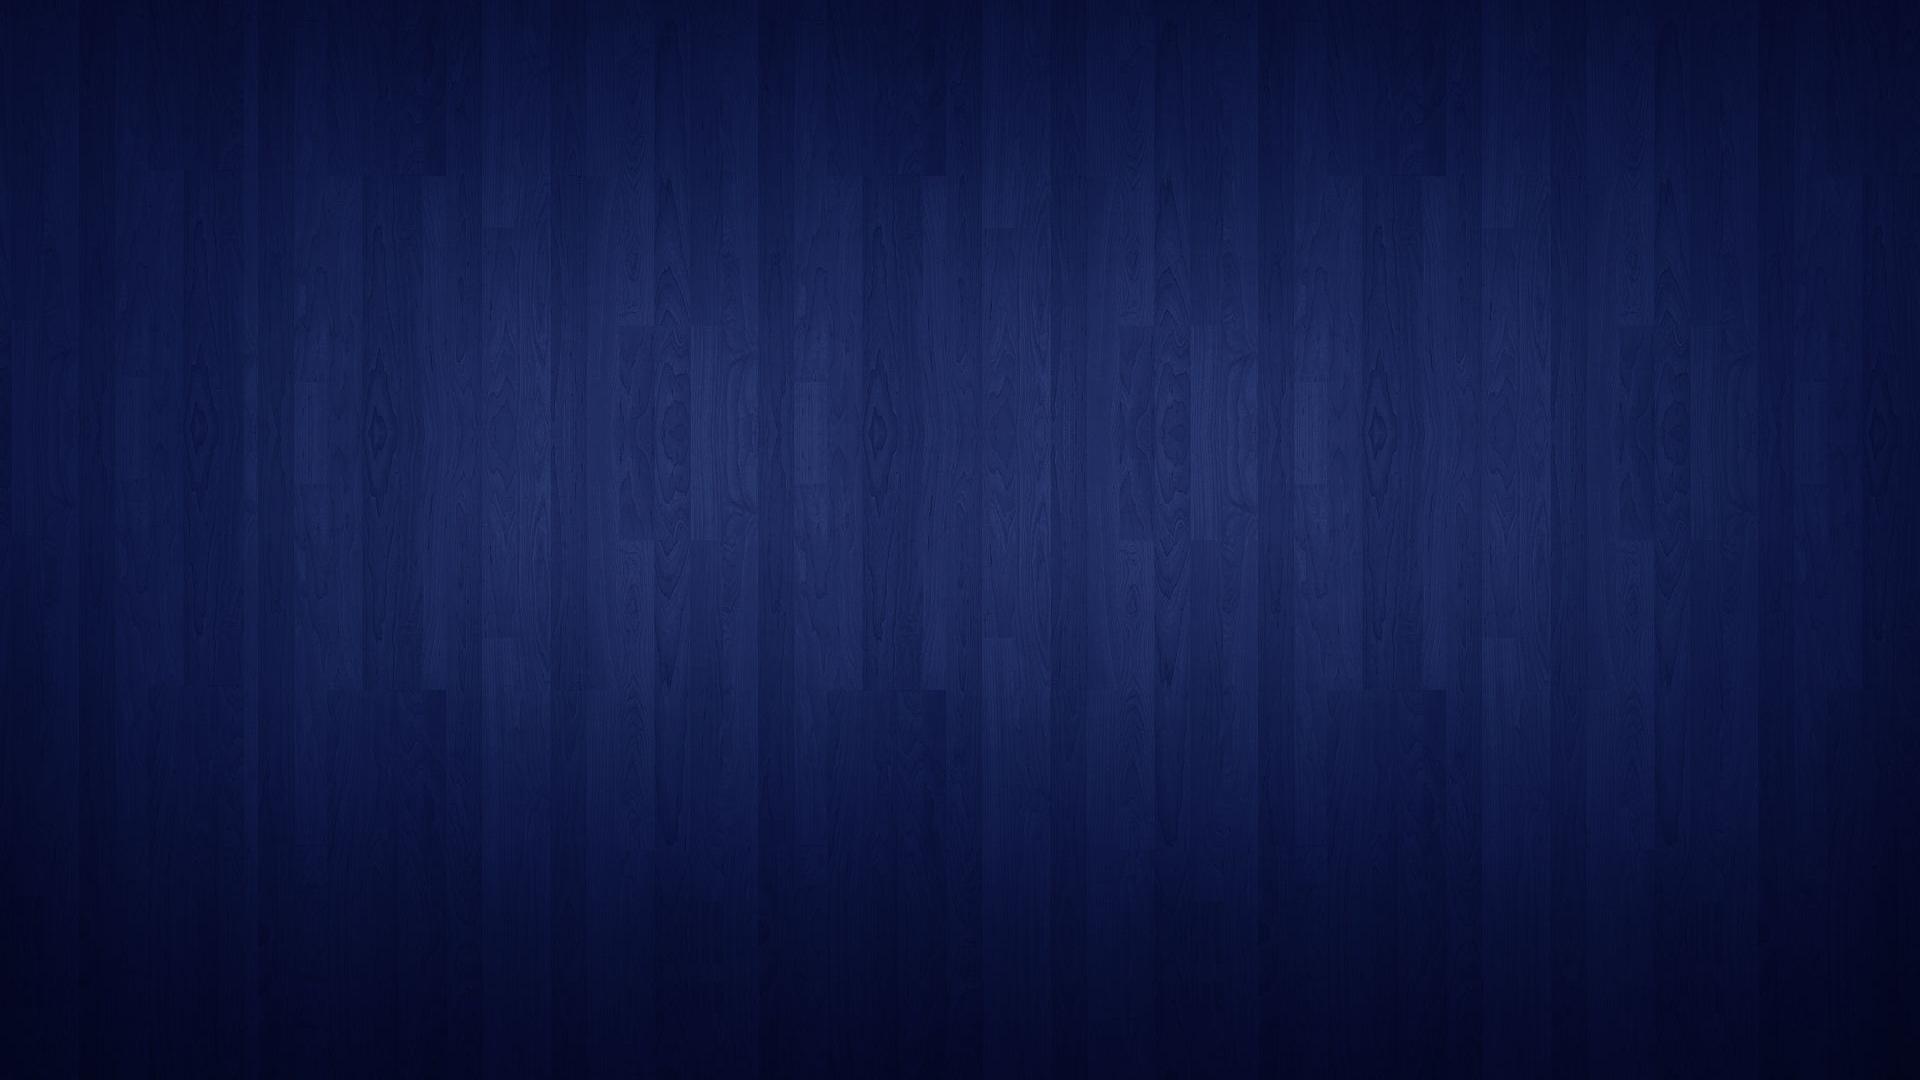 Free Download Best Background Images Navy Blue Navy Blue